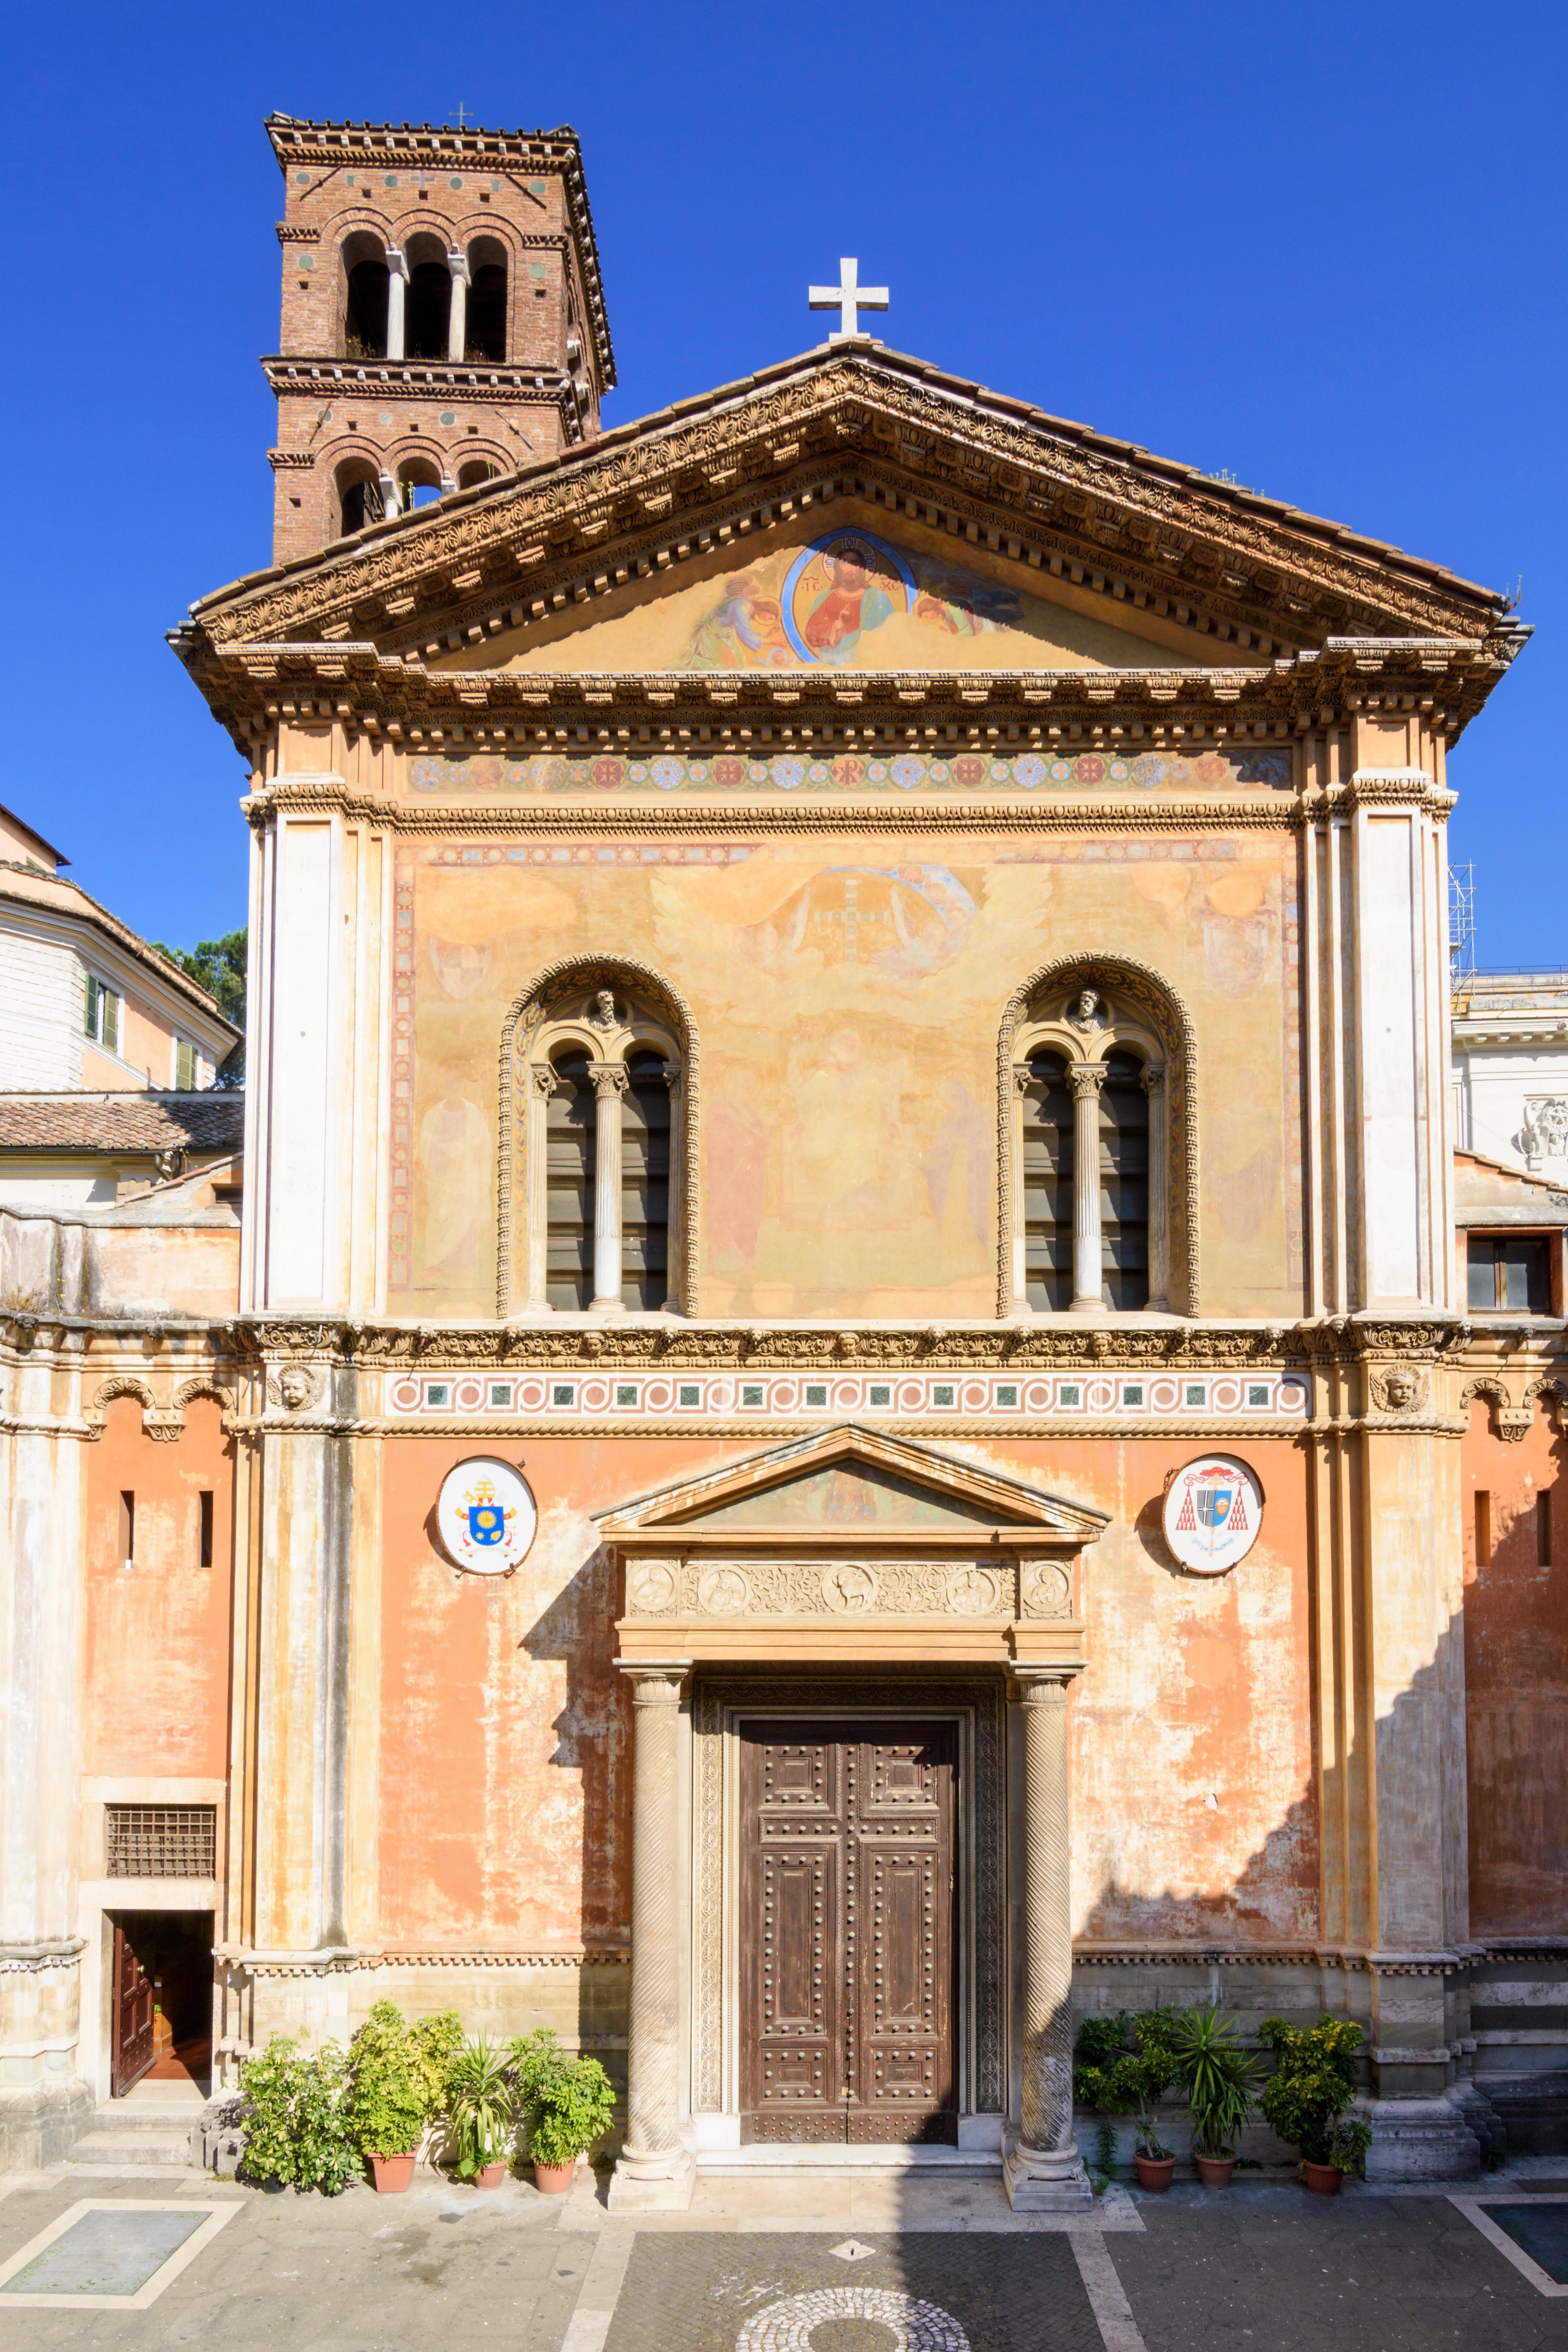 La Basilique Sainte-Pudentienne